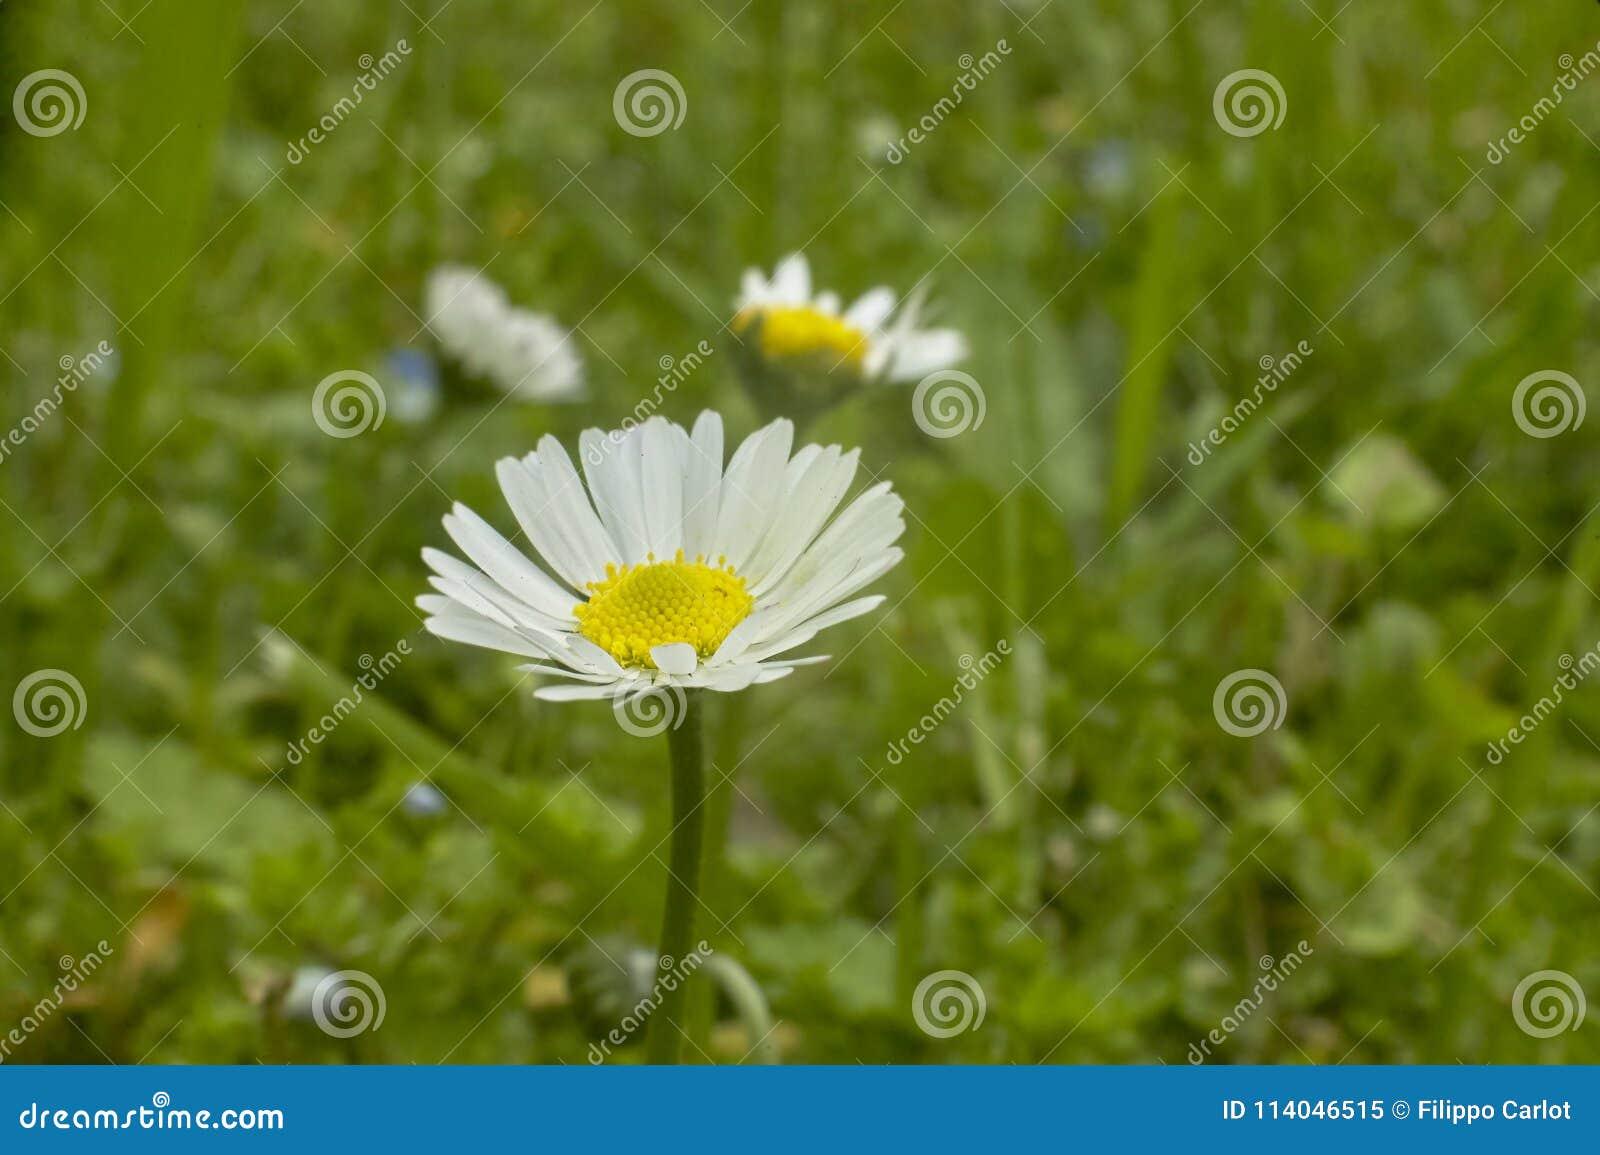 The daisy in the flower garden stock image image of daisy pistils the daisy in the flower garden izmirmasajfo